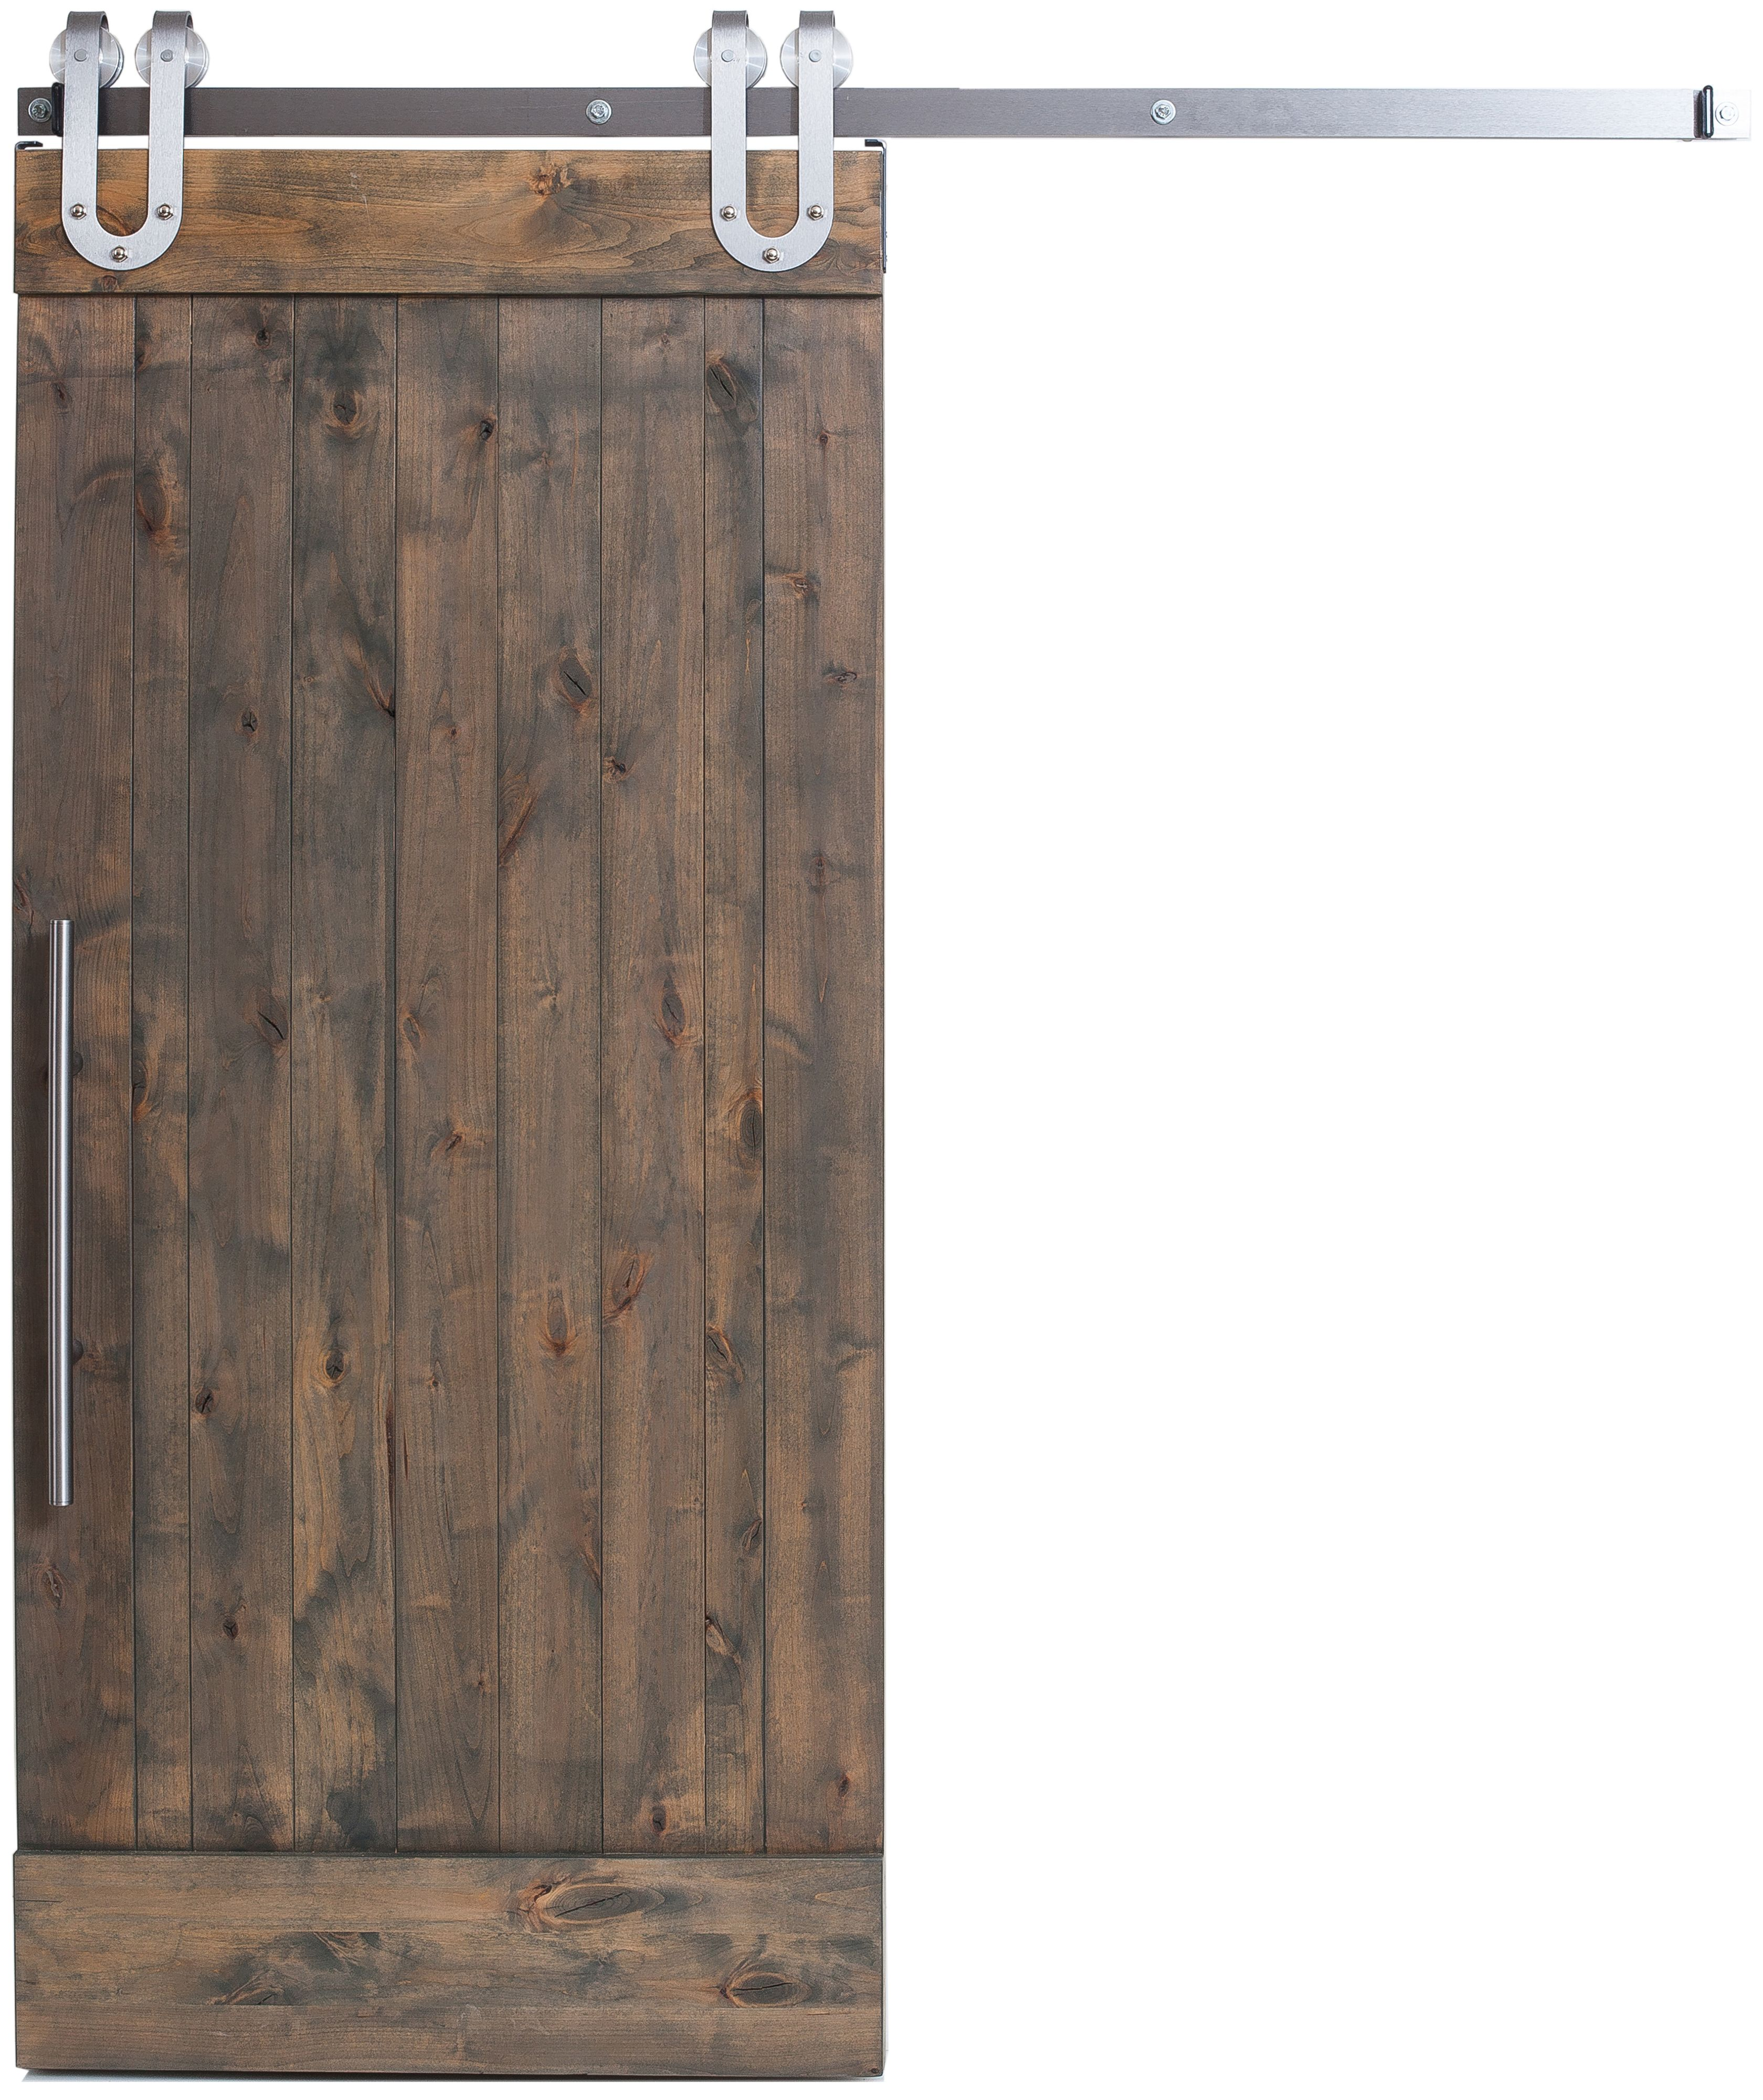 This Original Barn Door Predates Even The Z Style The True Is Composed Of Tall Vertical Slats Barn Door Interior Sliding Barn Doors Sliding Barn Door Hardware